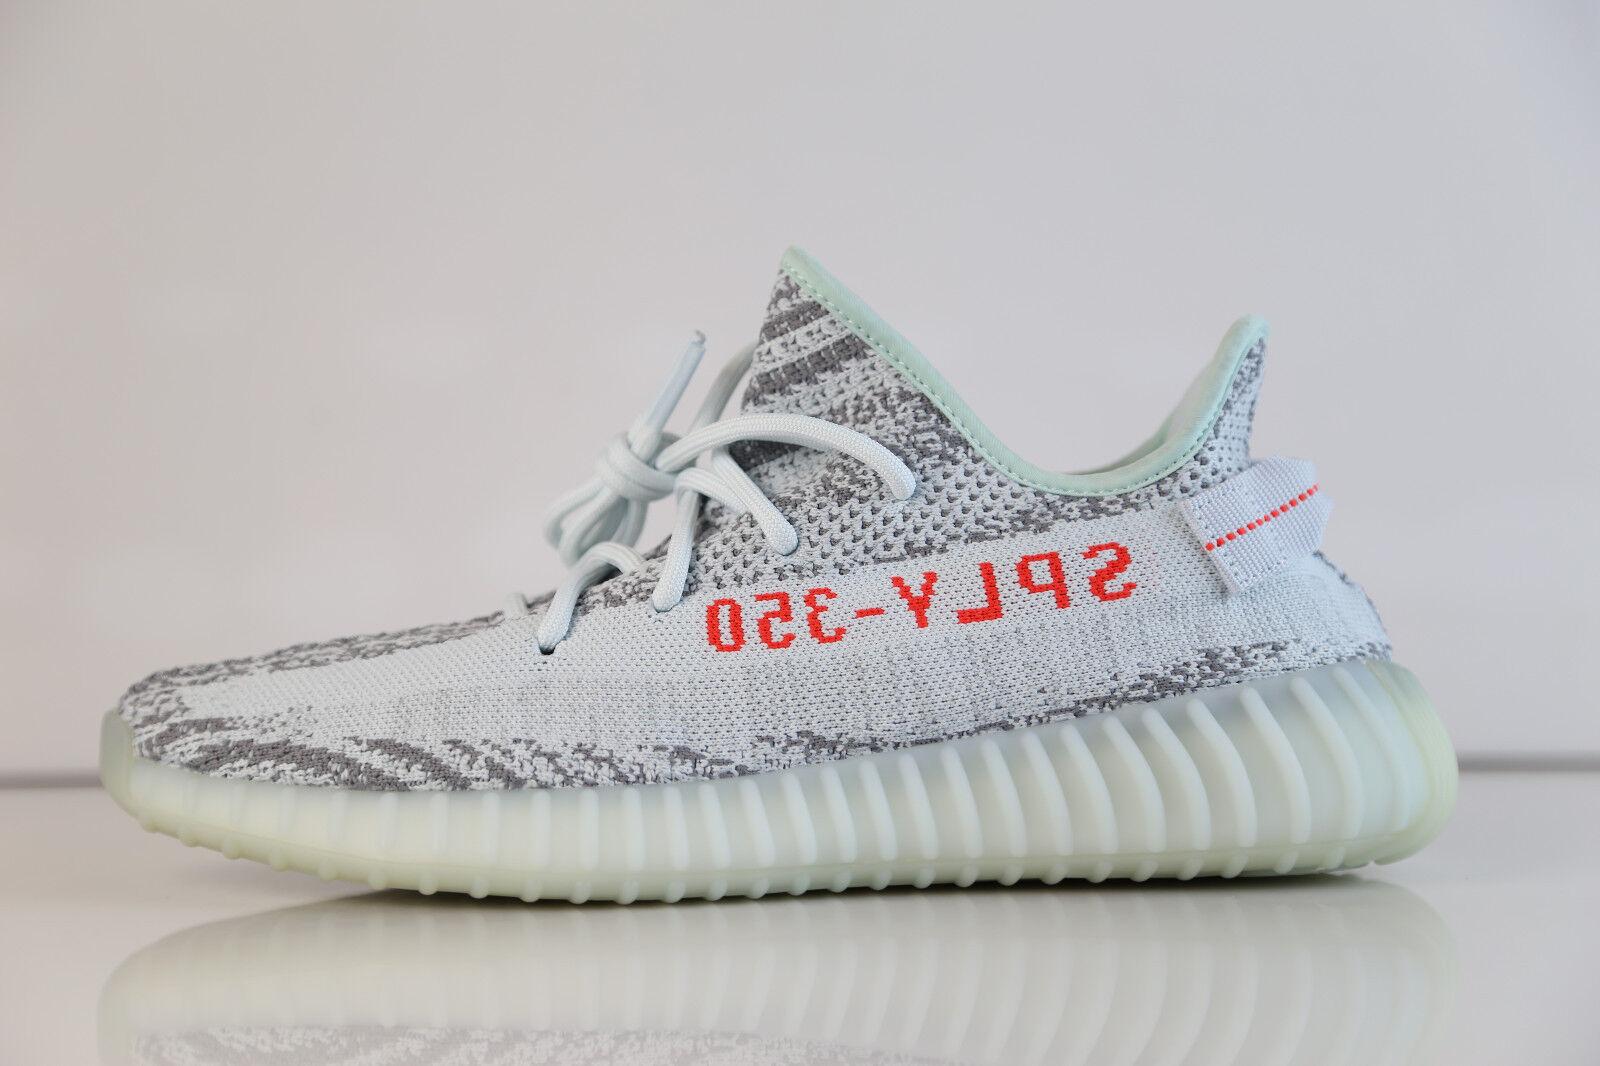 Adidas yeezy impulso kanye kanye impulso west, 350 v2 tinta grigio blu, tre in alta risoluzione b37571 513 1 e51c0c